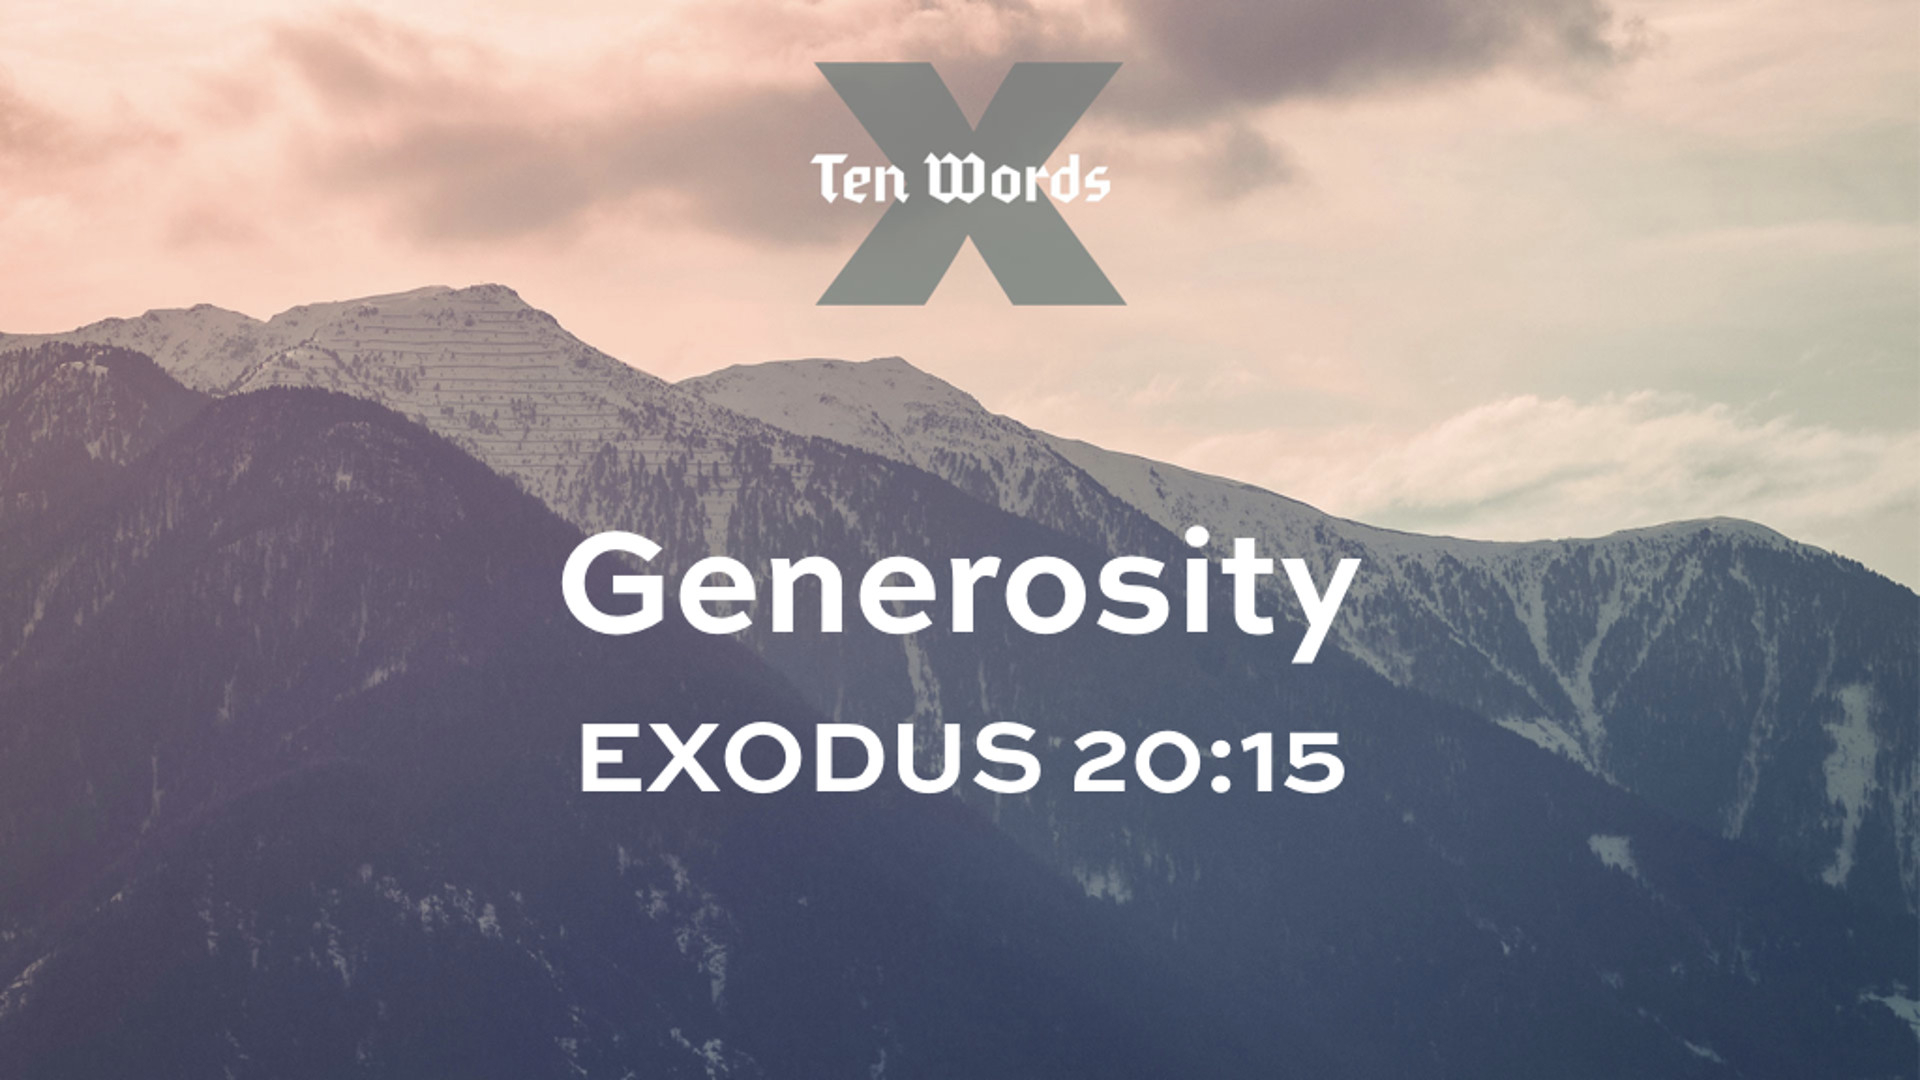 9 Generosity - Ex 20.15.jpg